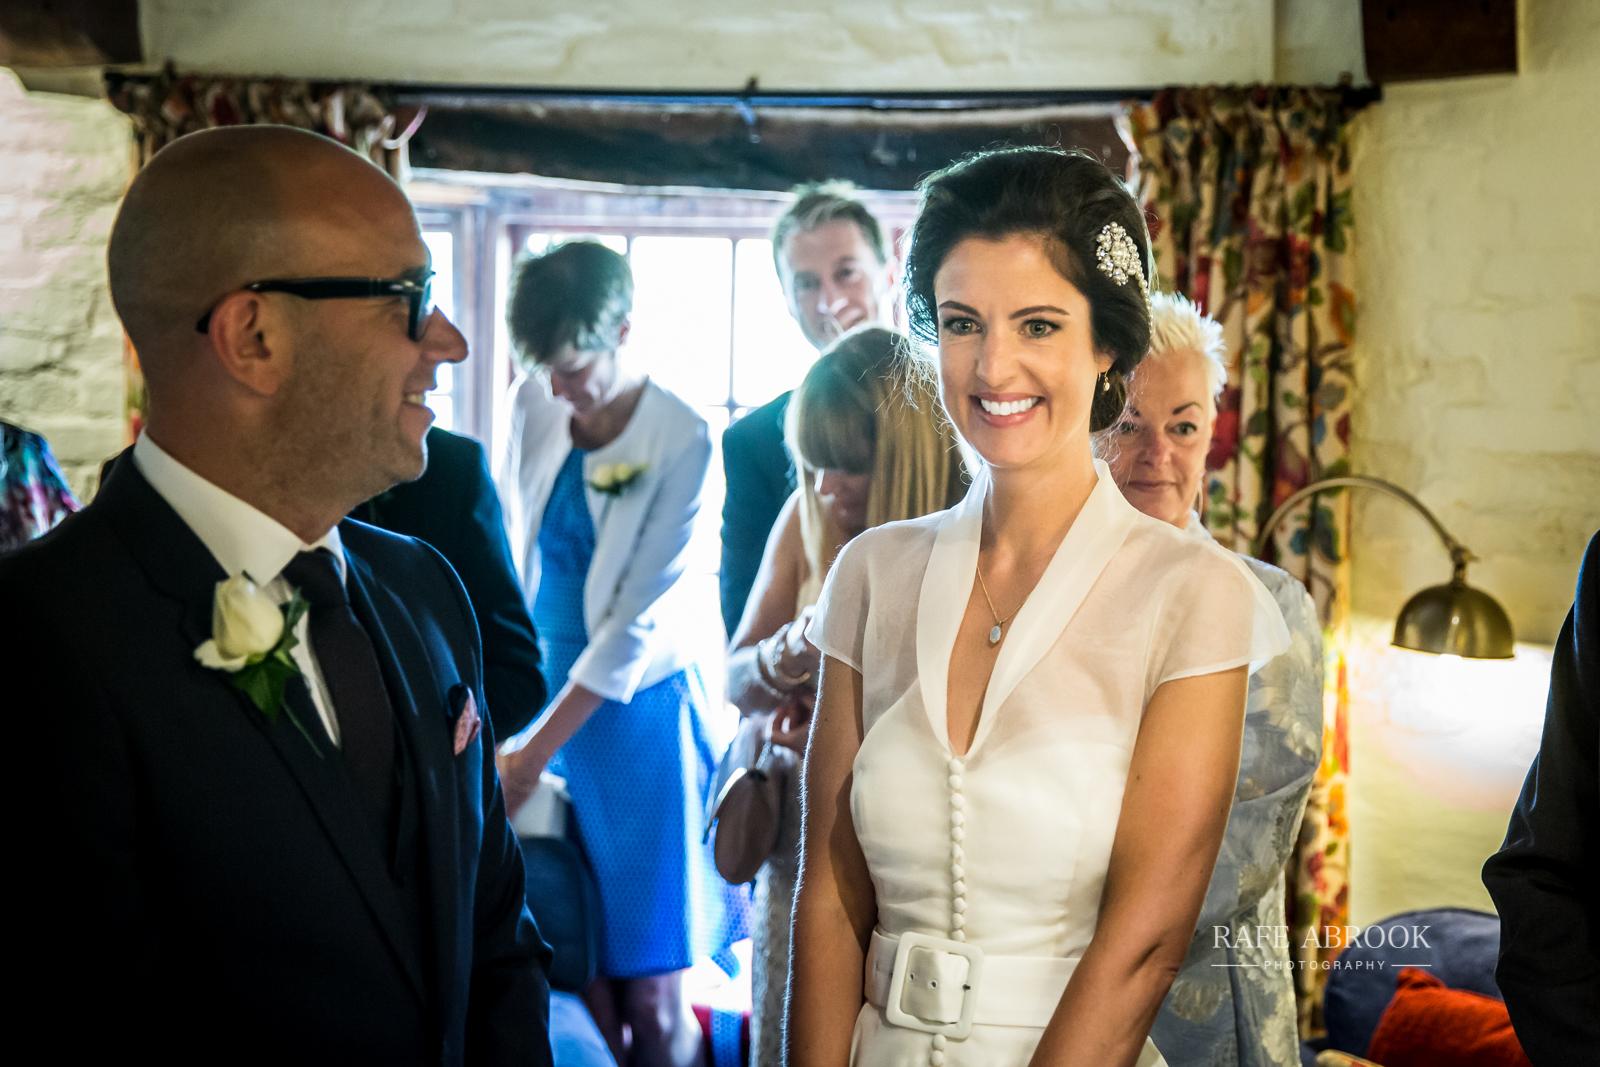 cley windmill wedding norfolk hertfordshire wedding photographer-1099.jpg